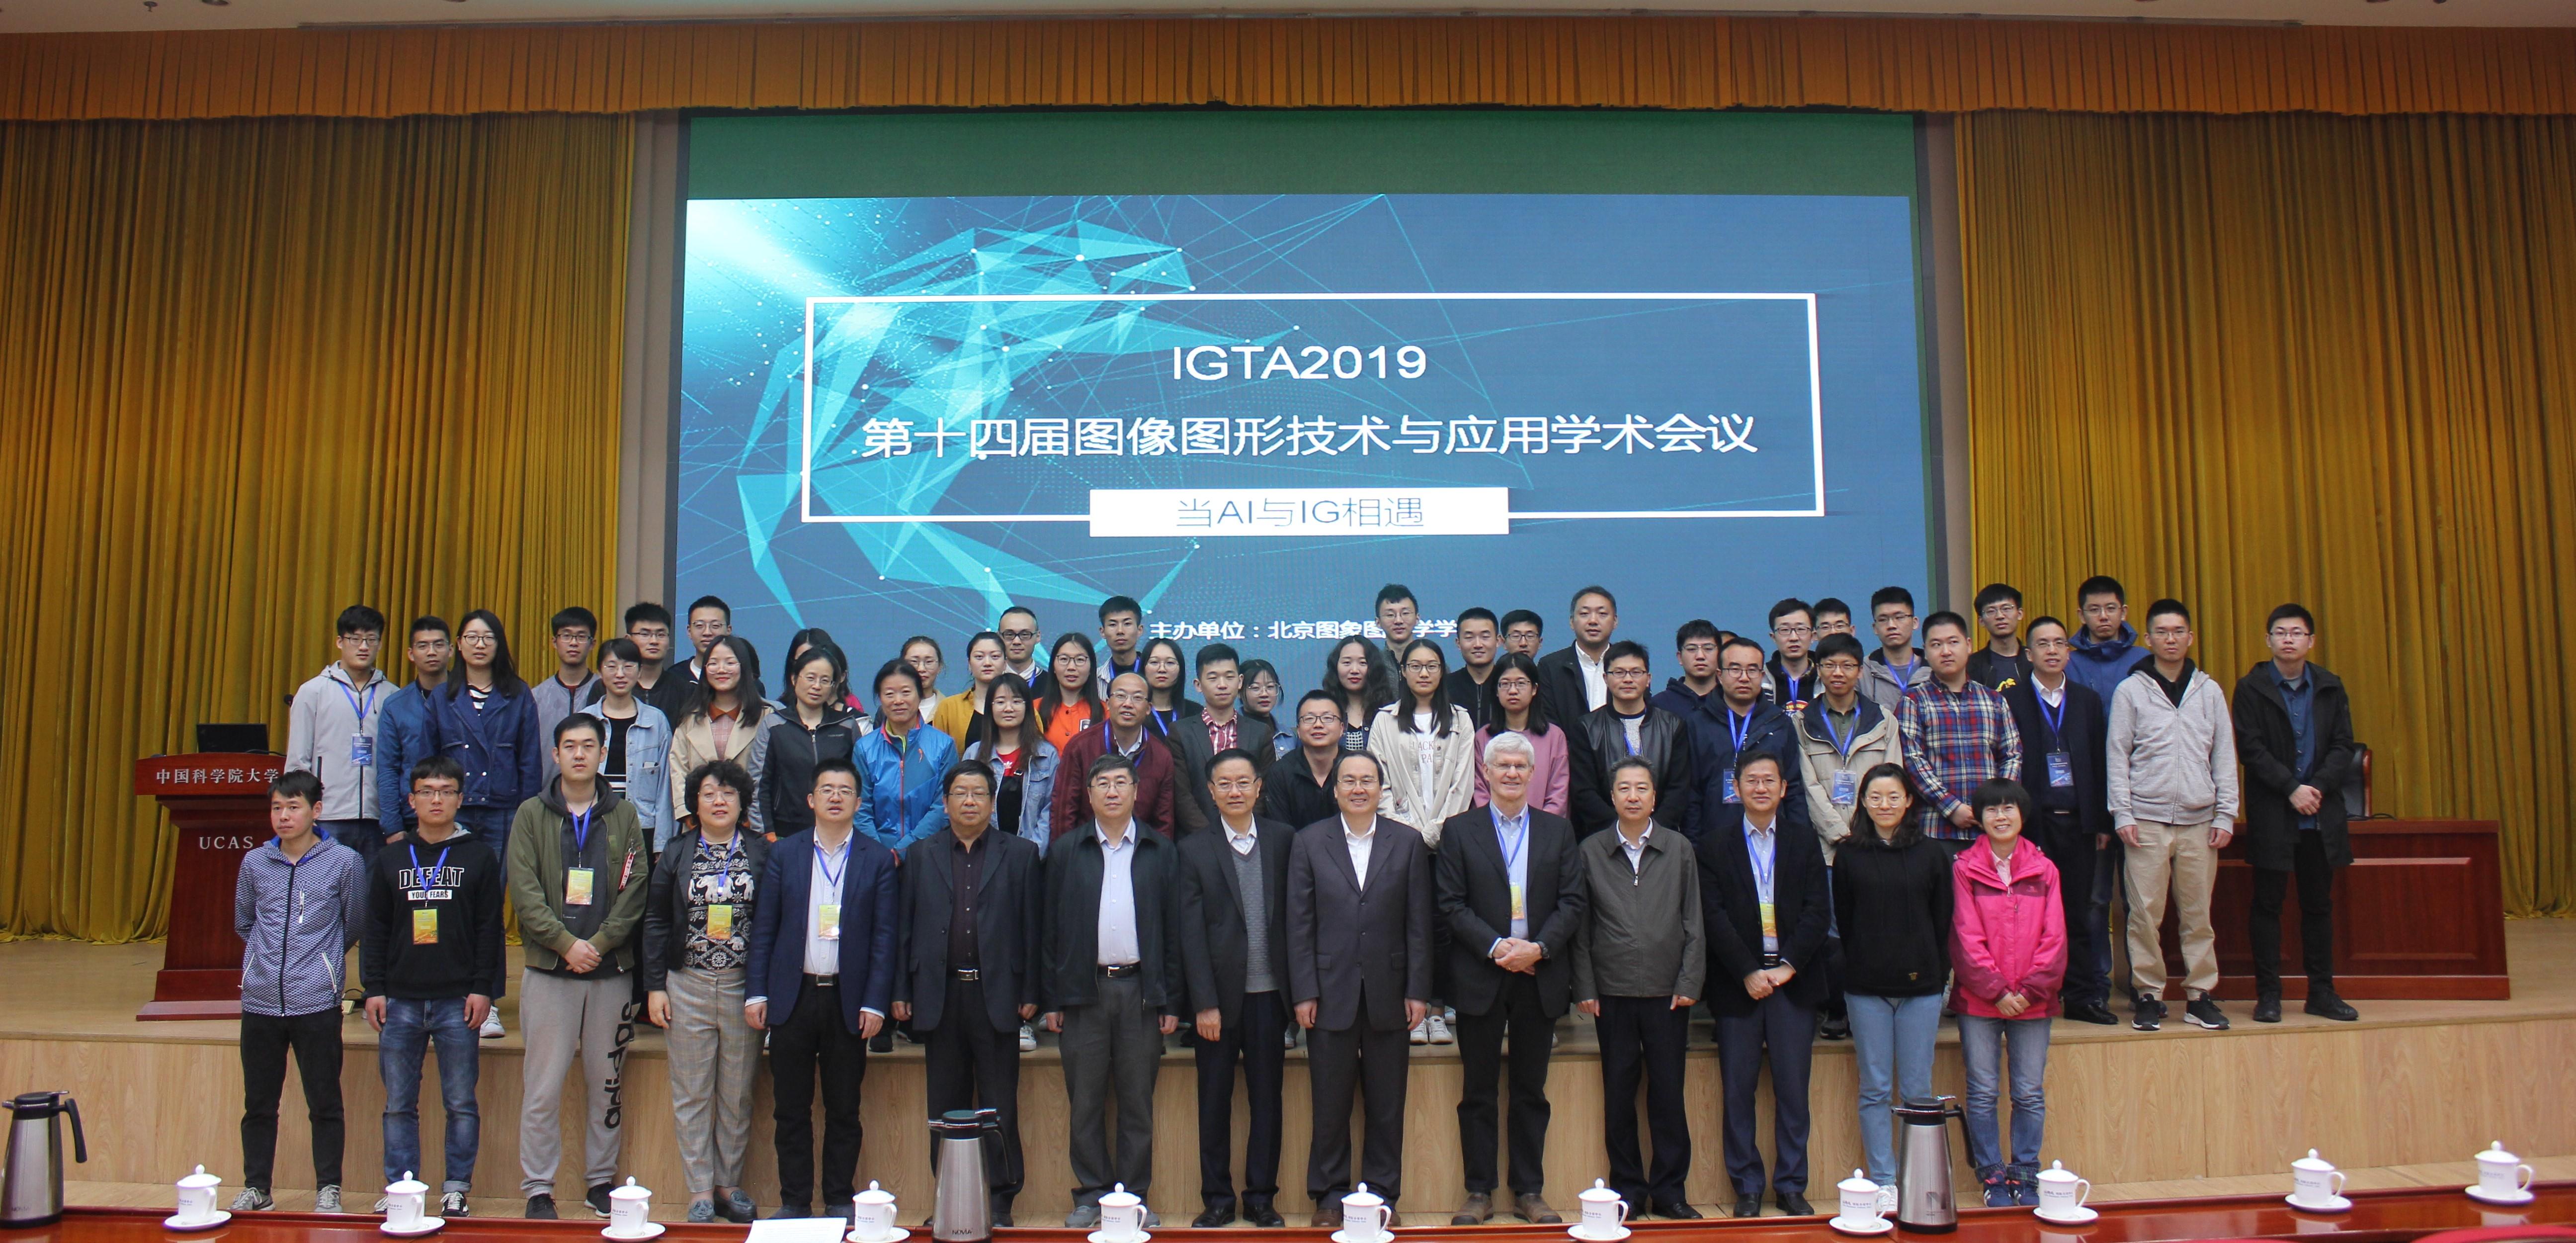 IGTA2019在国科大成功举办!